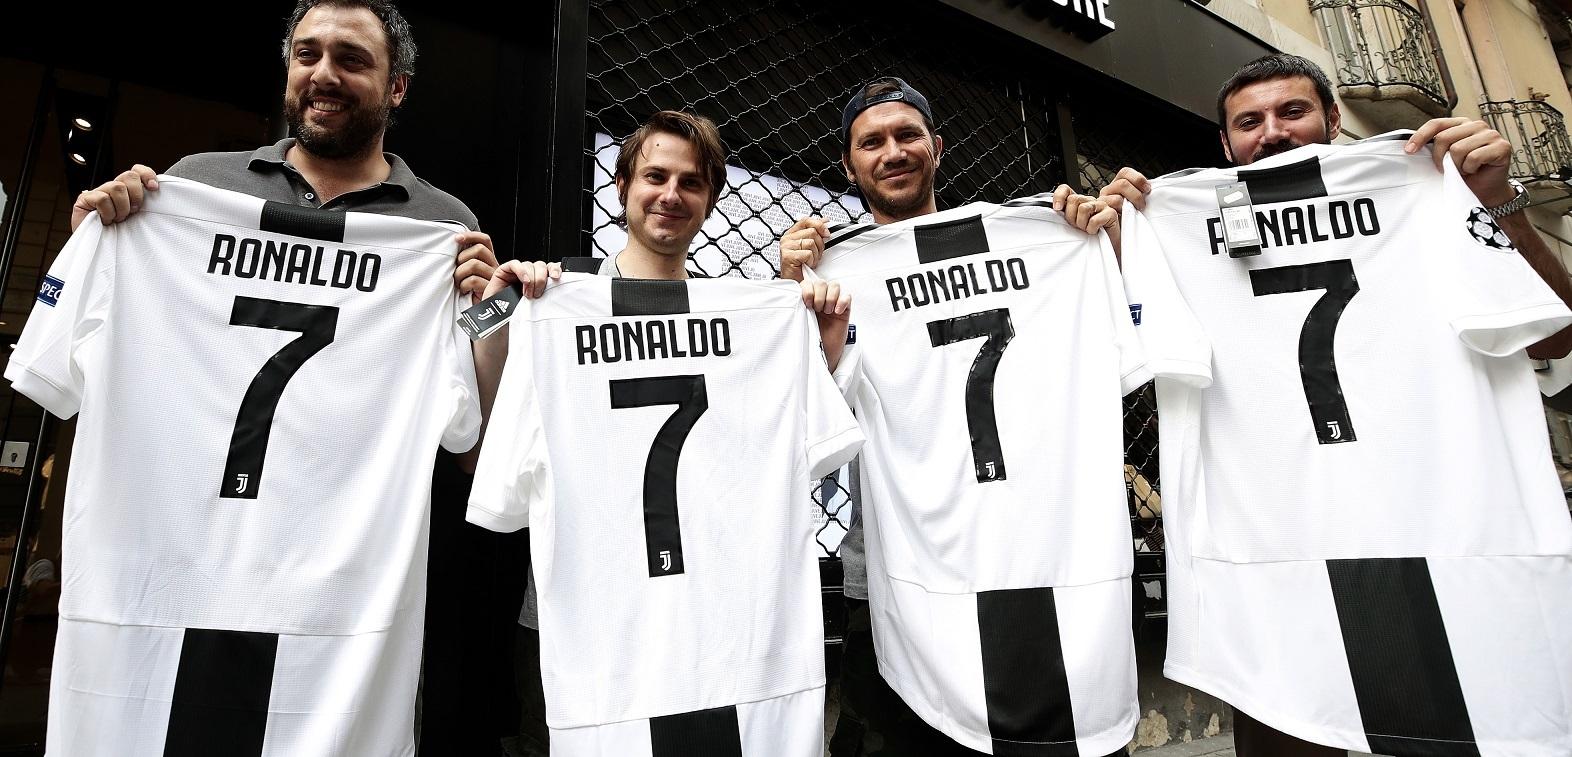 maillot Cristiano Ronaldo